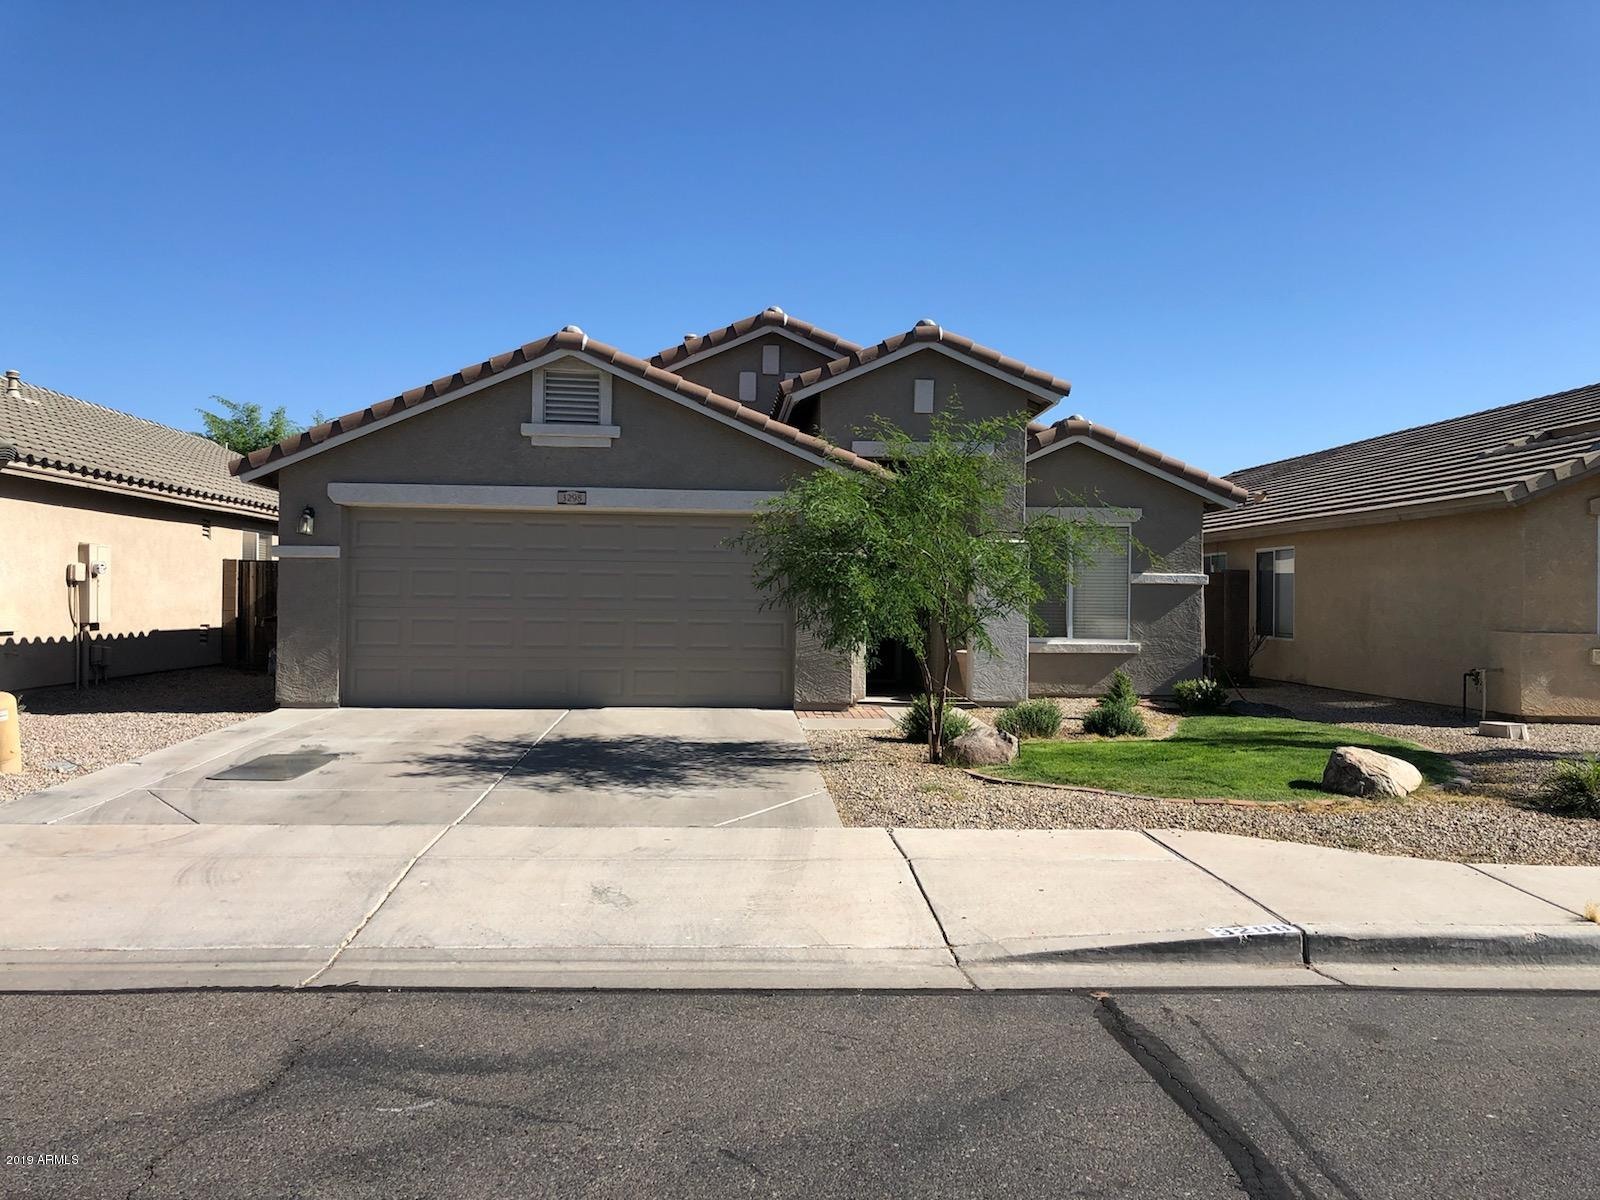 Photo of 3298 W FIVE MILE PEAK Drive, Queen Creek, AZ 85142